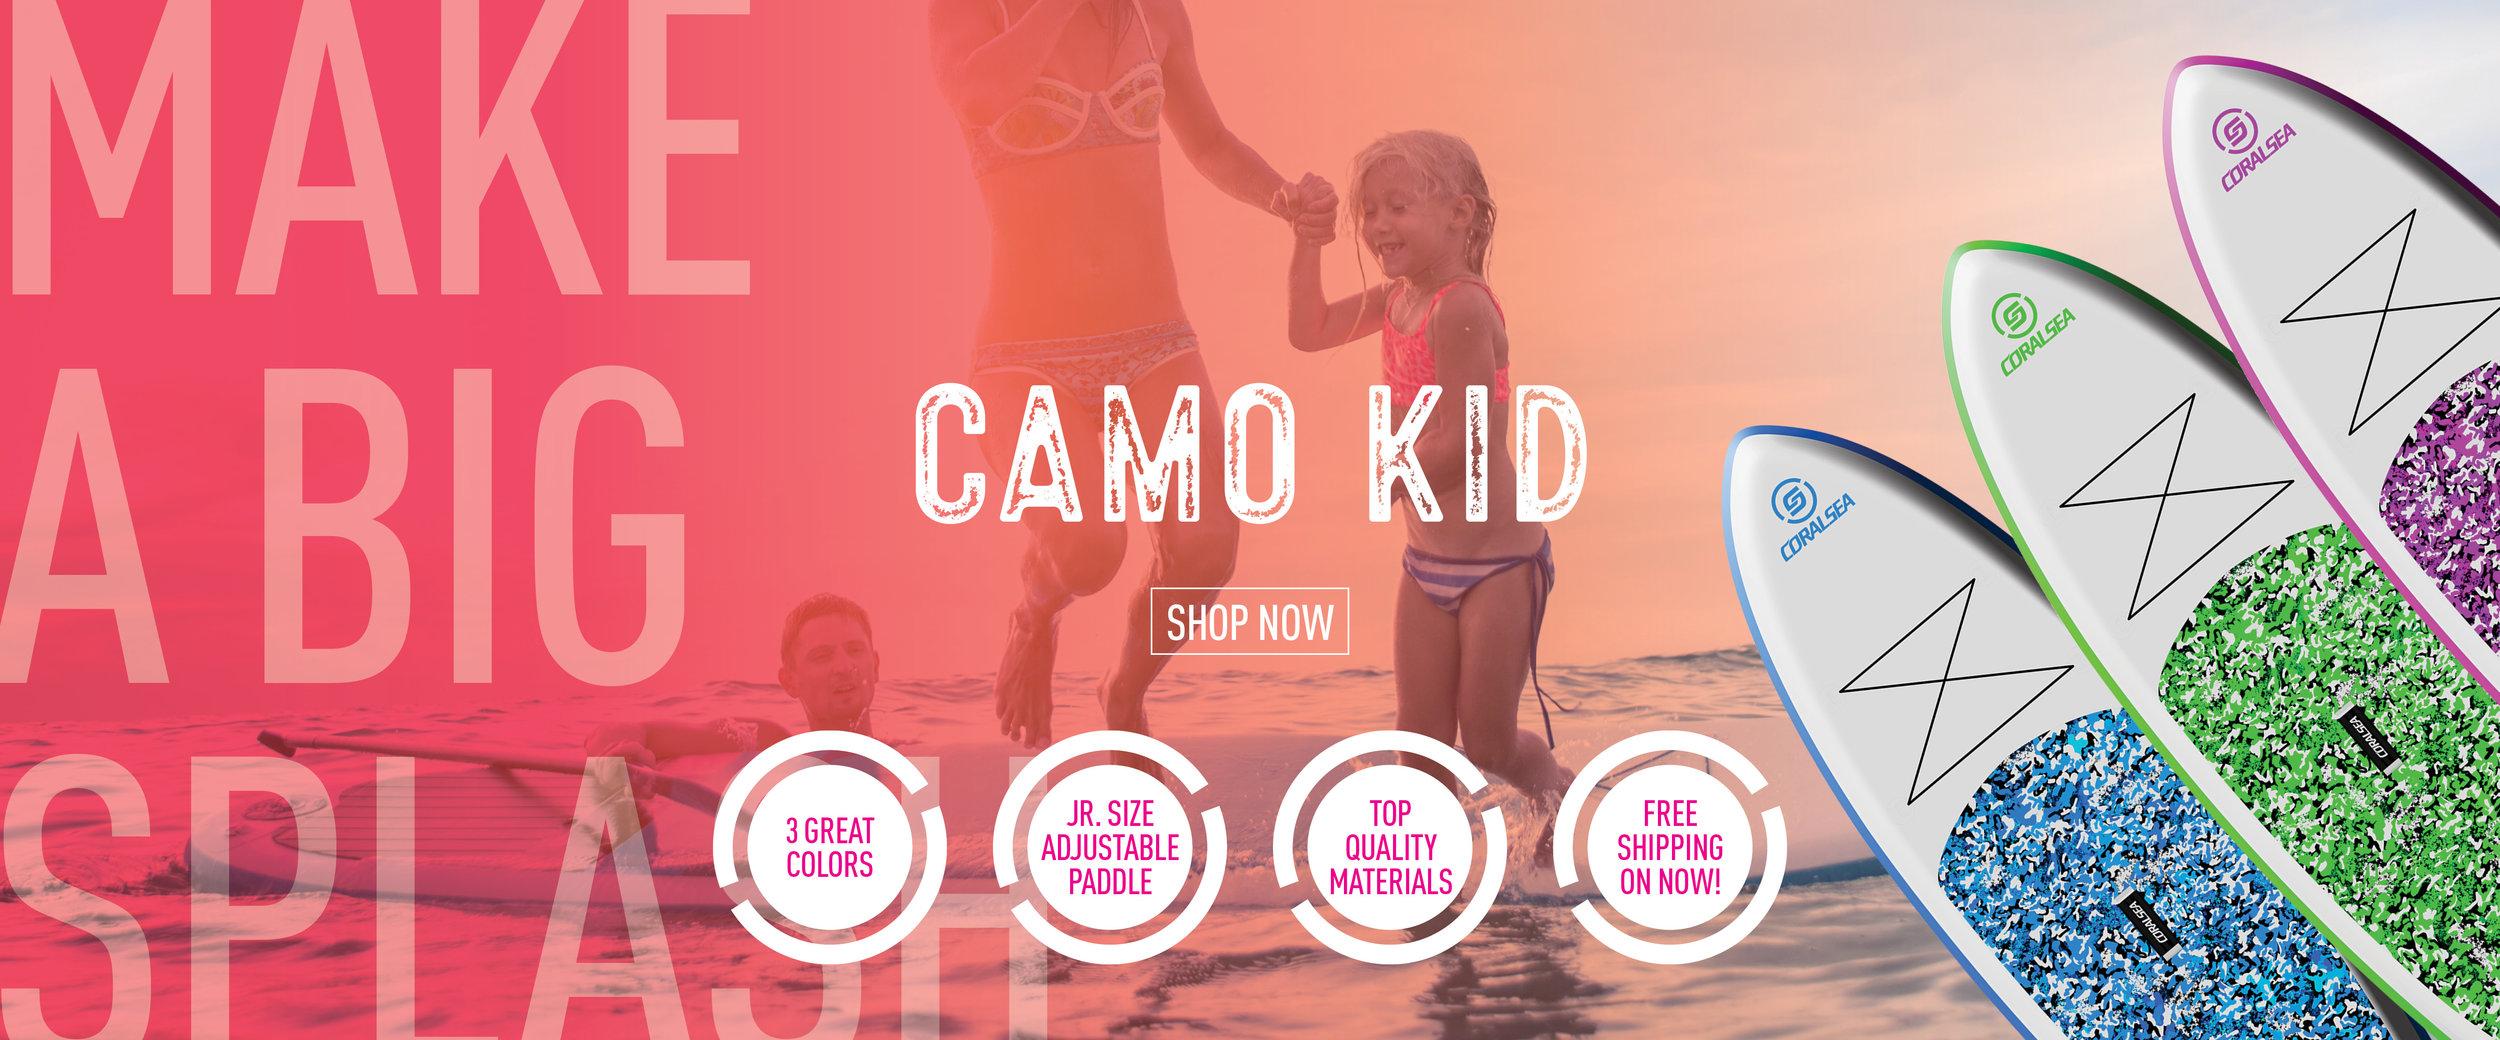 SUP-CoralSea-CamoKids-HomePage2016.jpg